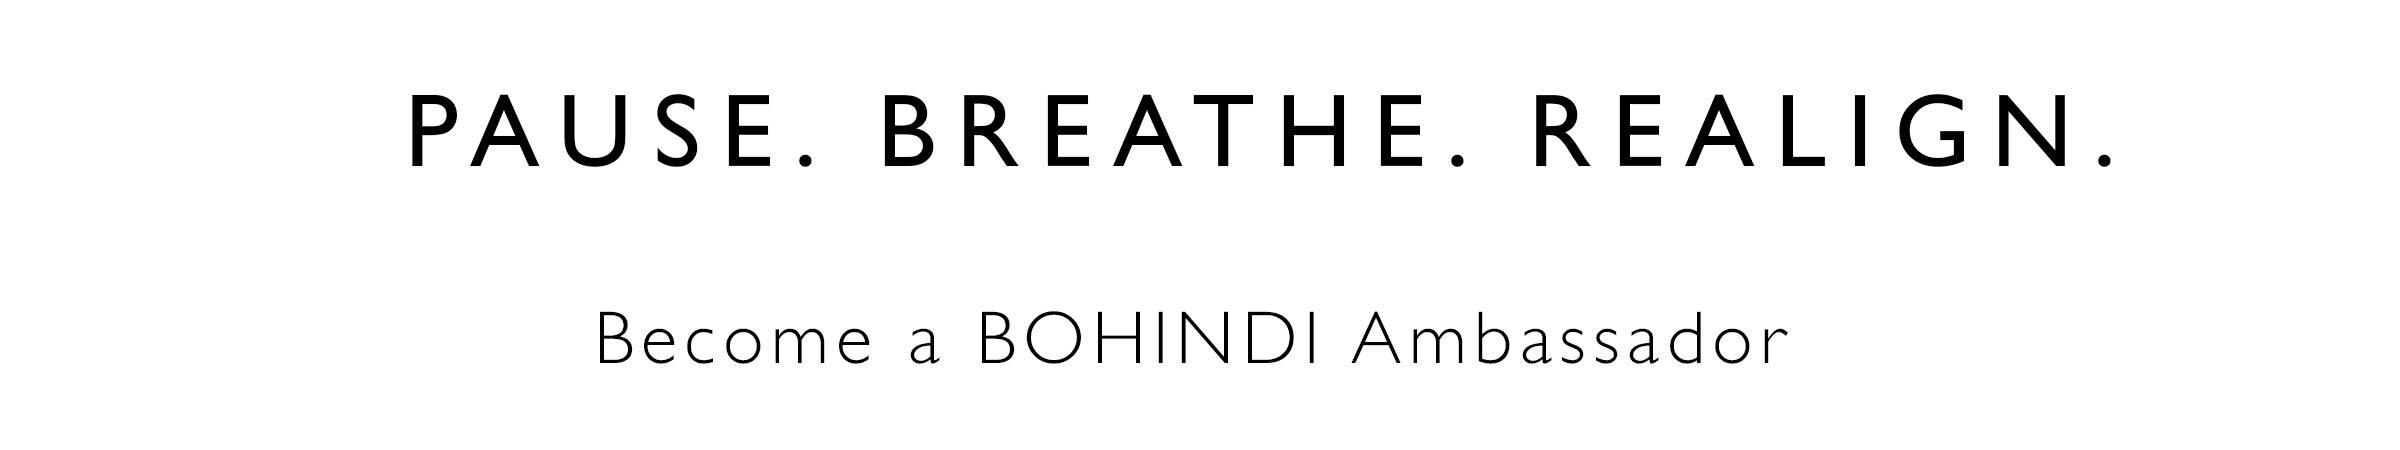 bohindi ambassador.jpg